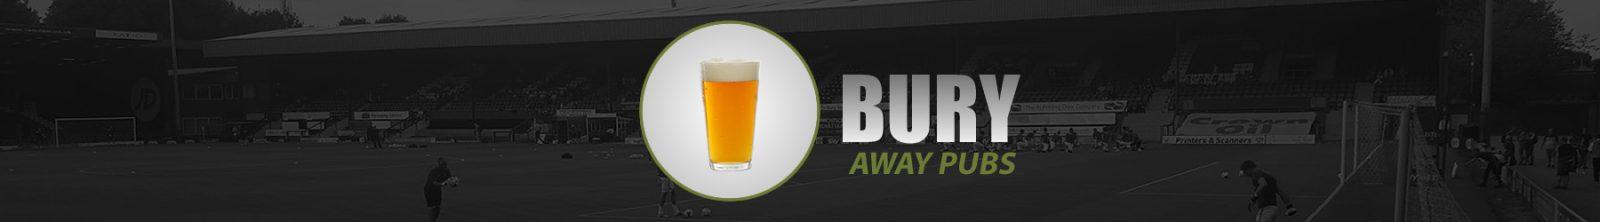 Bury Away Pubs